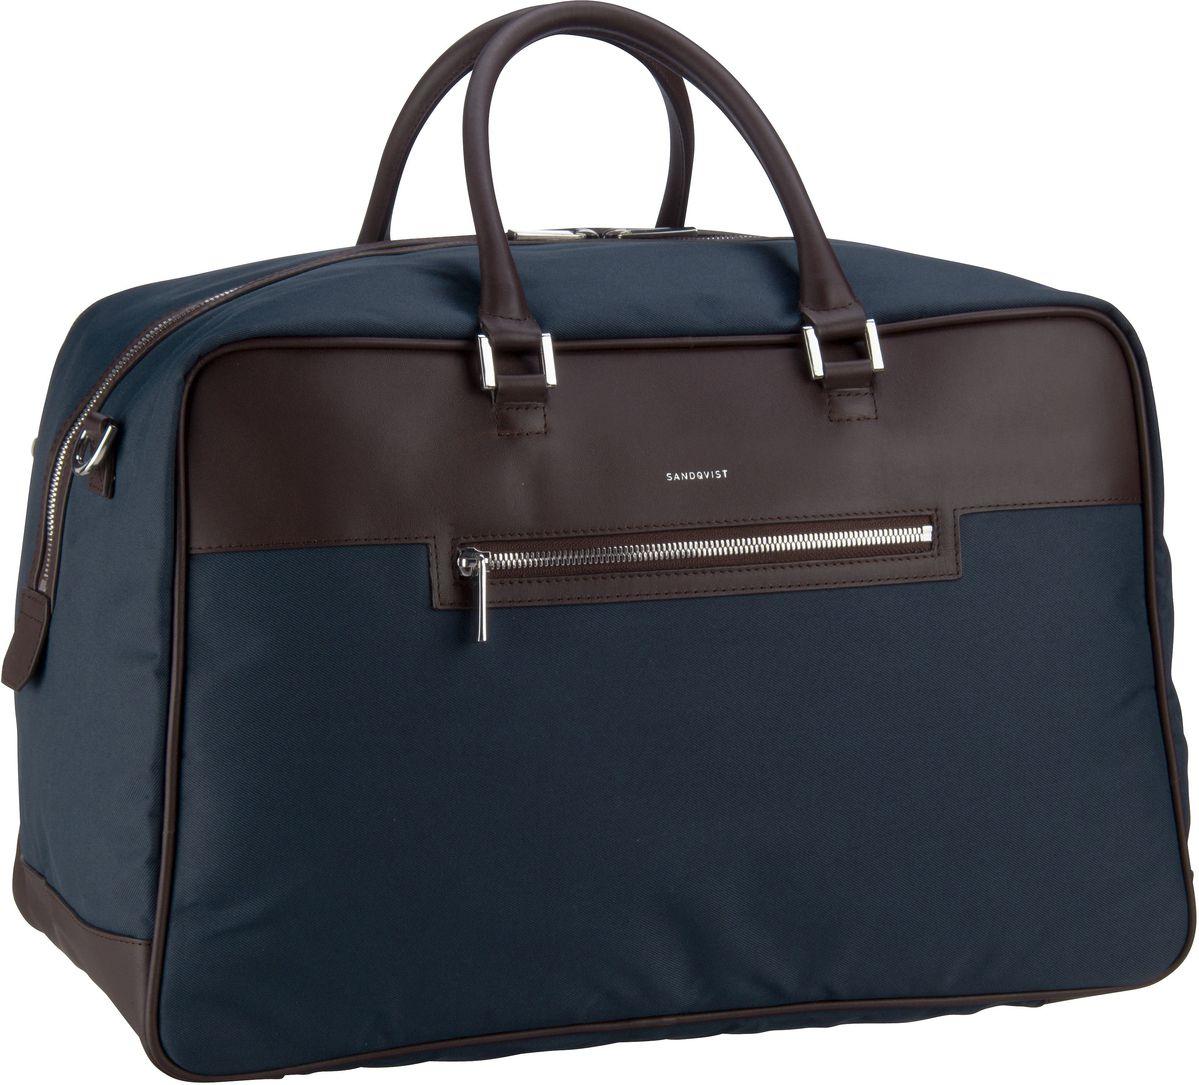 Sandqvist Weekender Mattias Weekend Bag Navy (28 Liter)